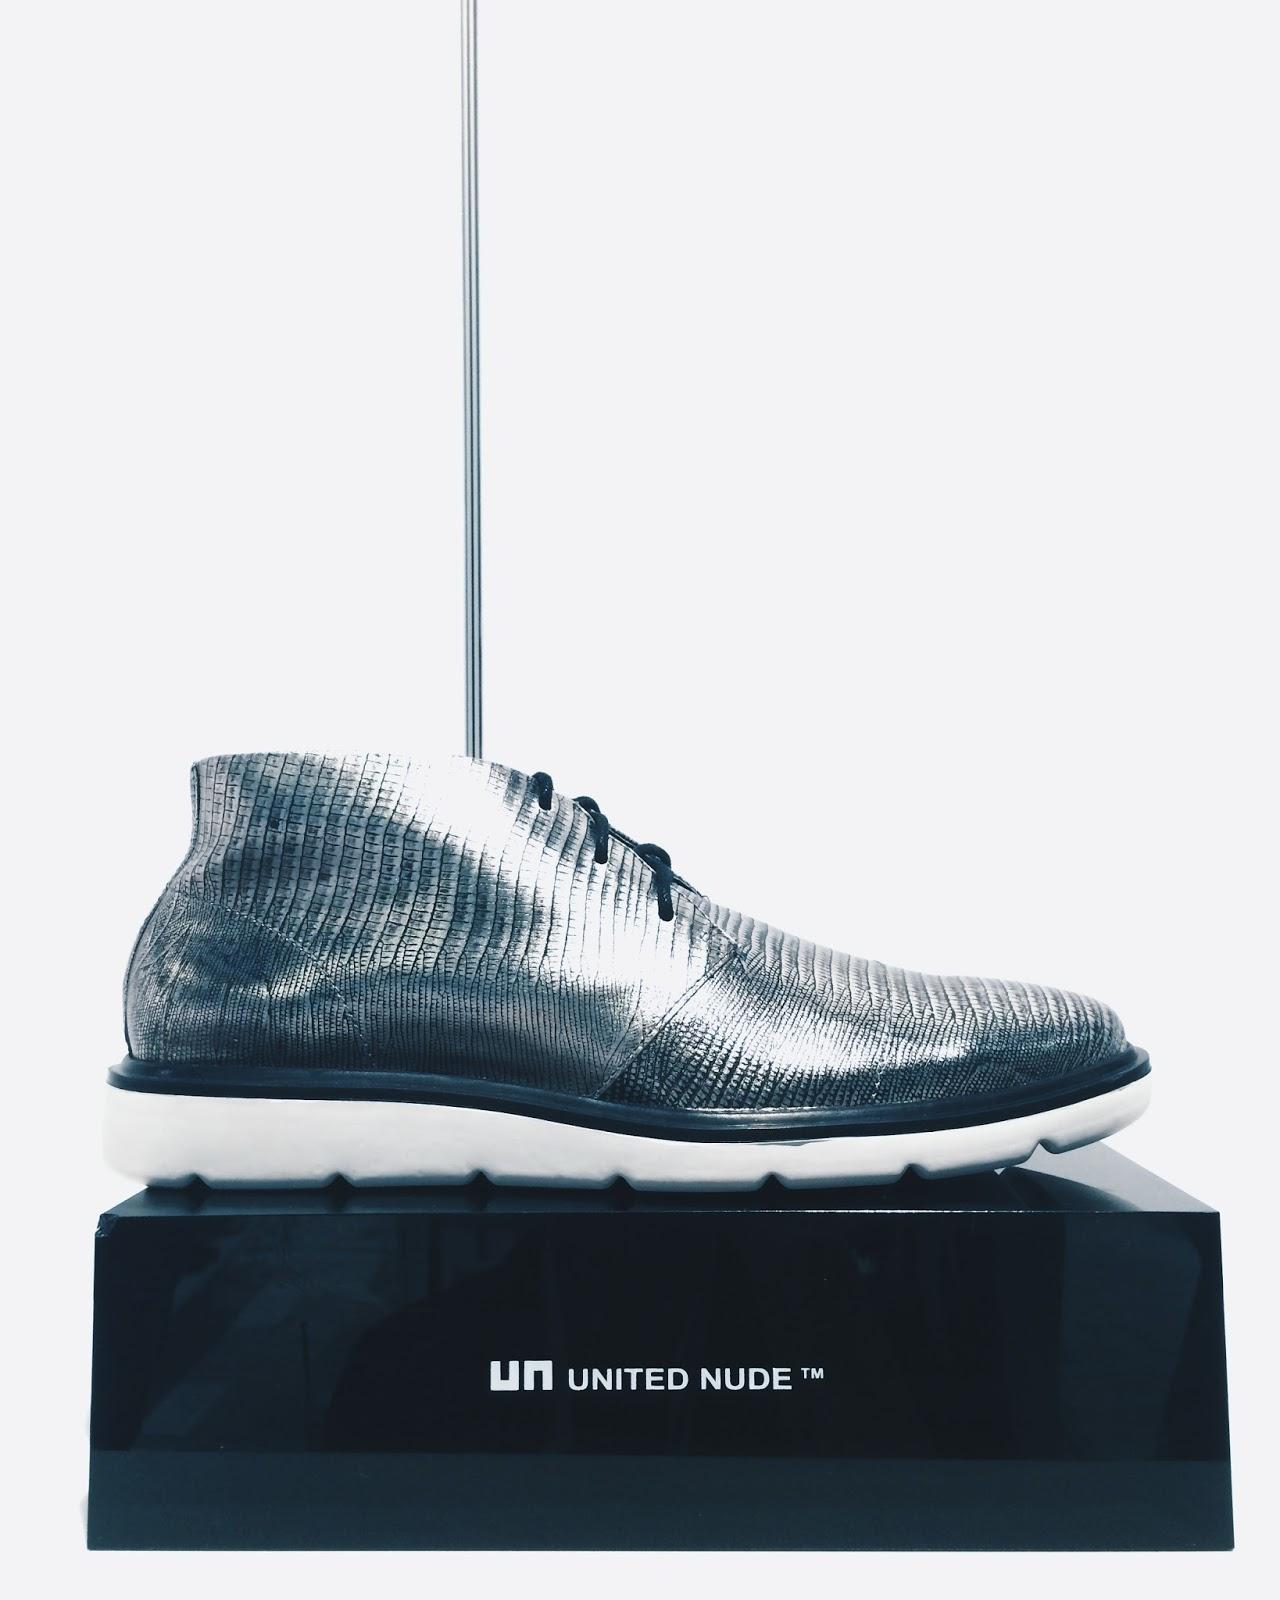 unitednude-mens-shoes-ss15.jpg